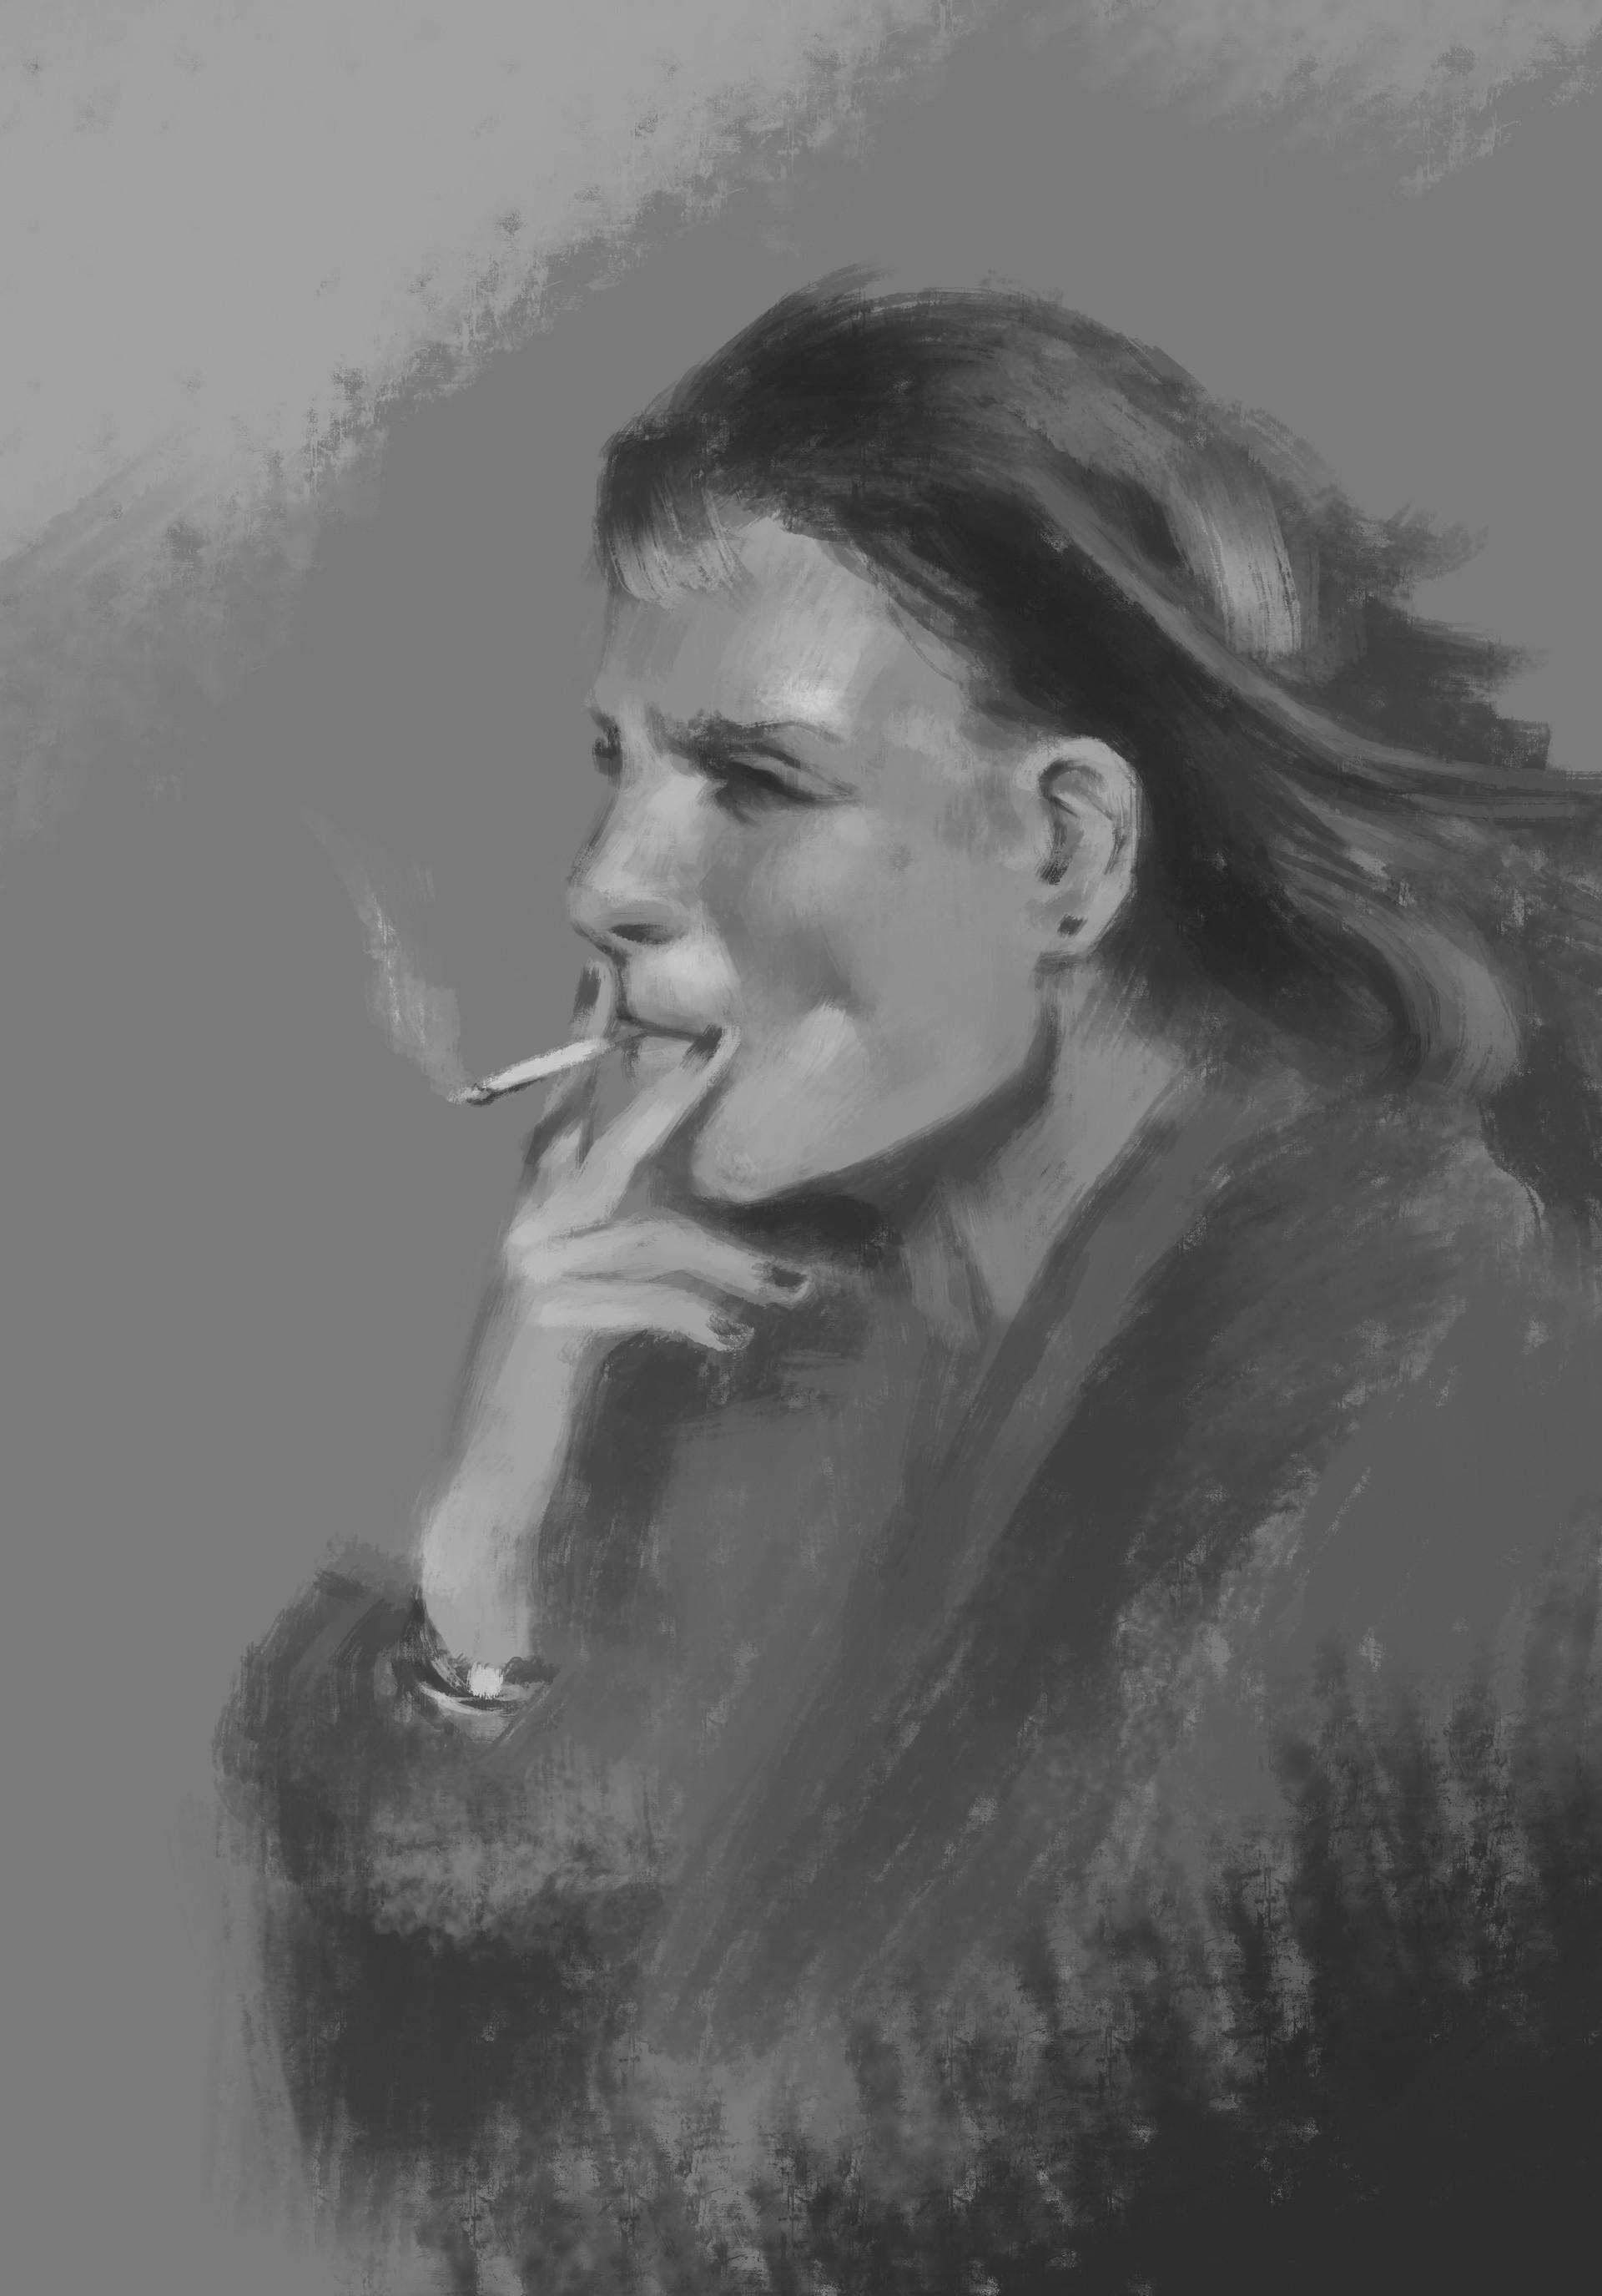 Holger schulz fem smoking